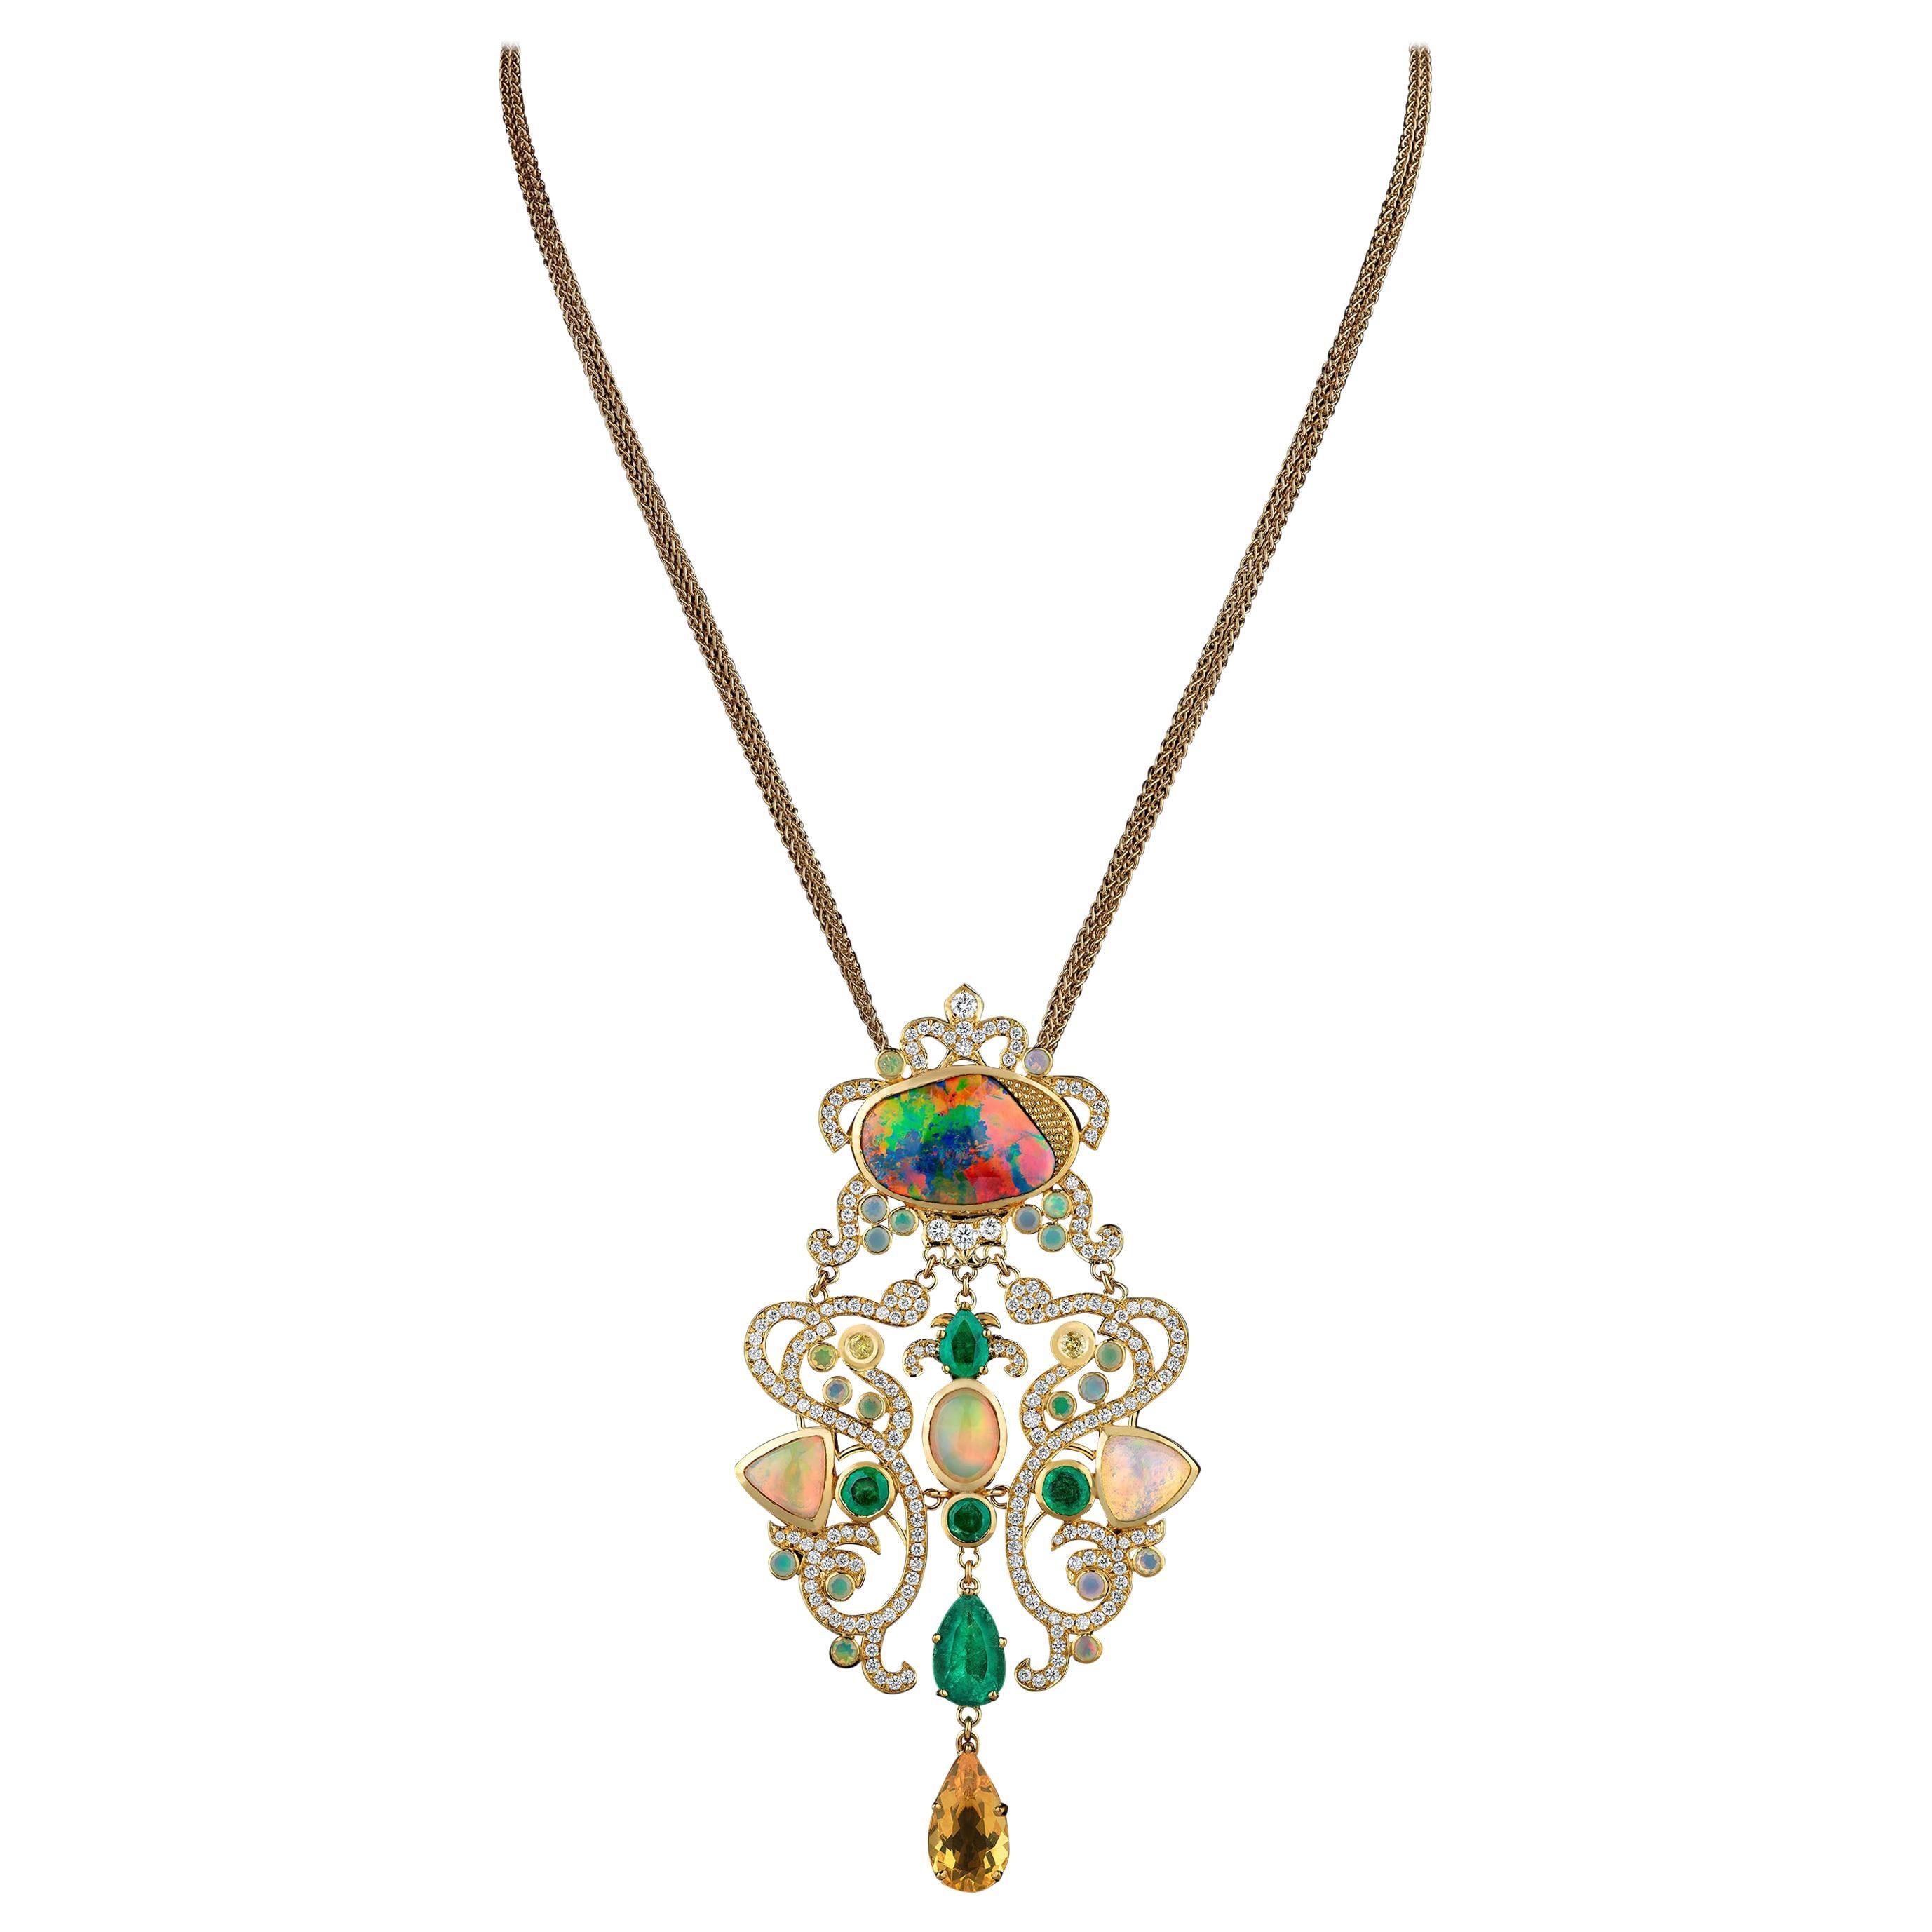 18 Karat Yellow Gold Opals Emeralds Diamonds Pendant Necklace Colorful Classic